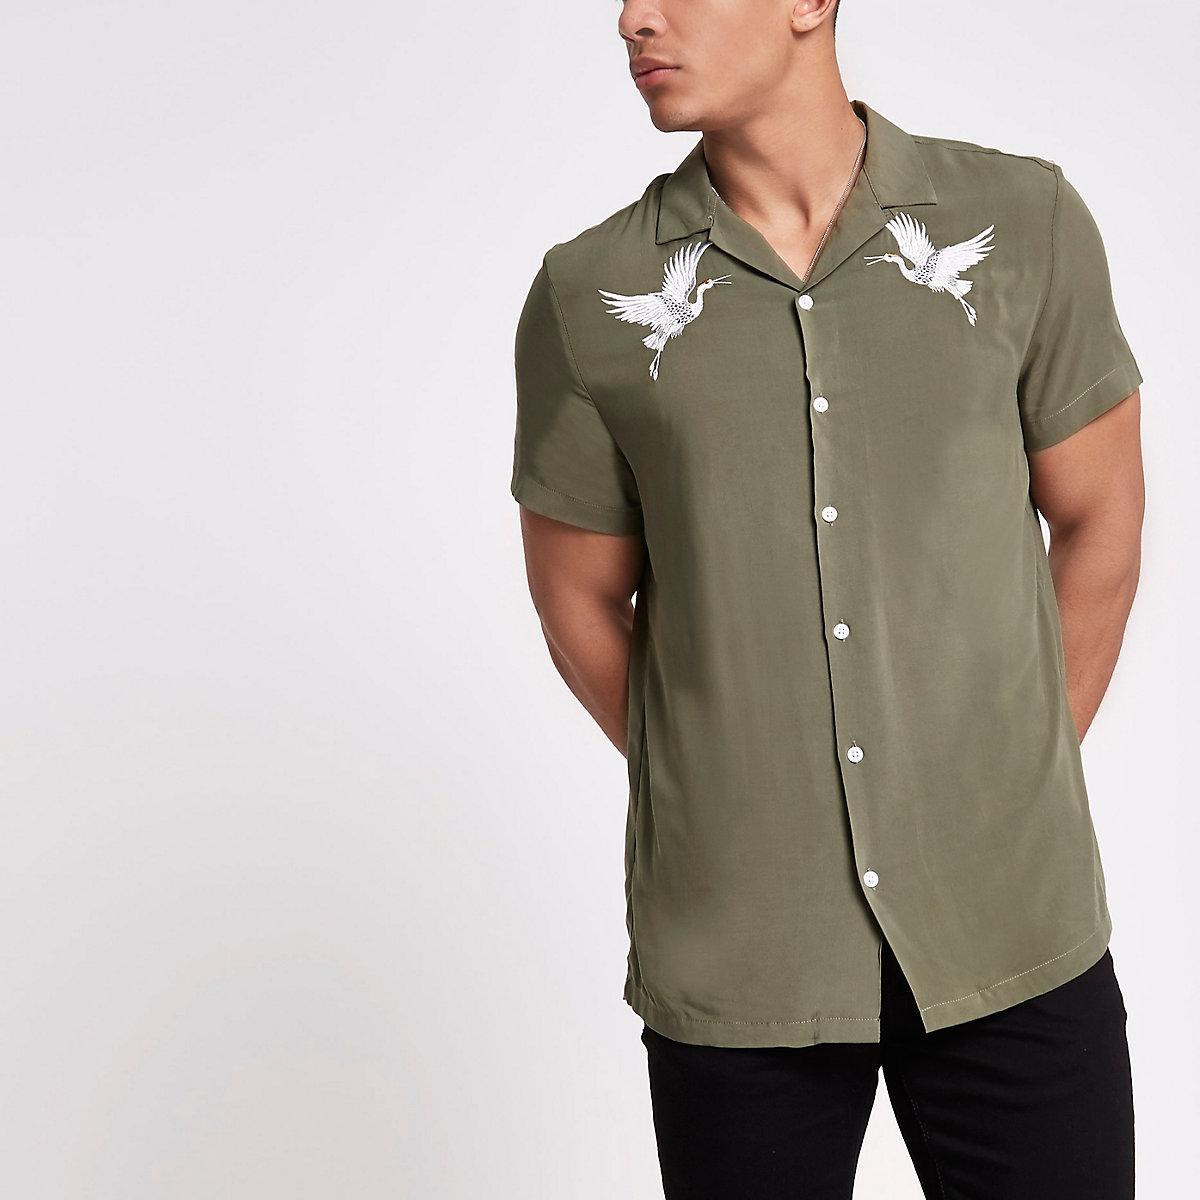 Khaki Crane Embroidered Revere Shirt Short Sleeve Shirts Shirts